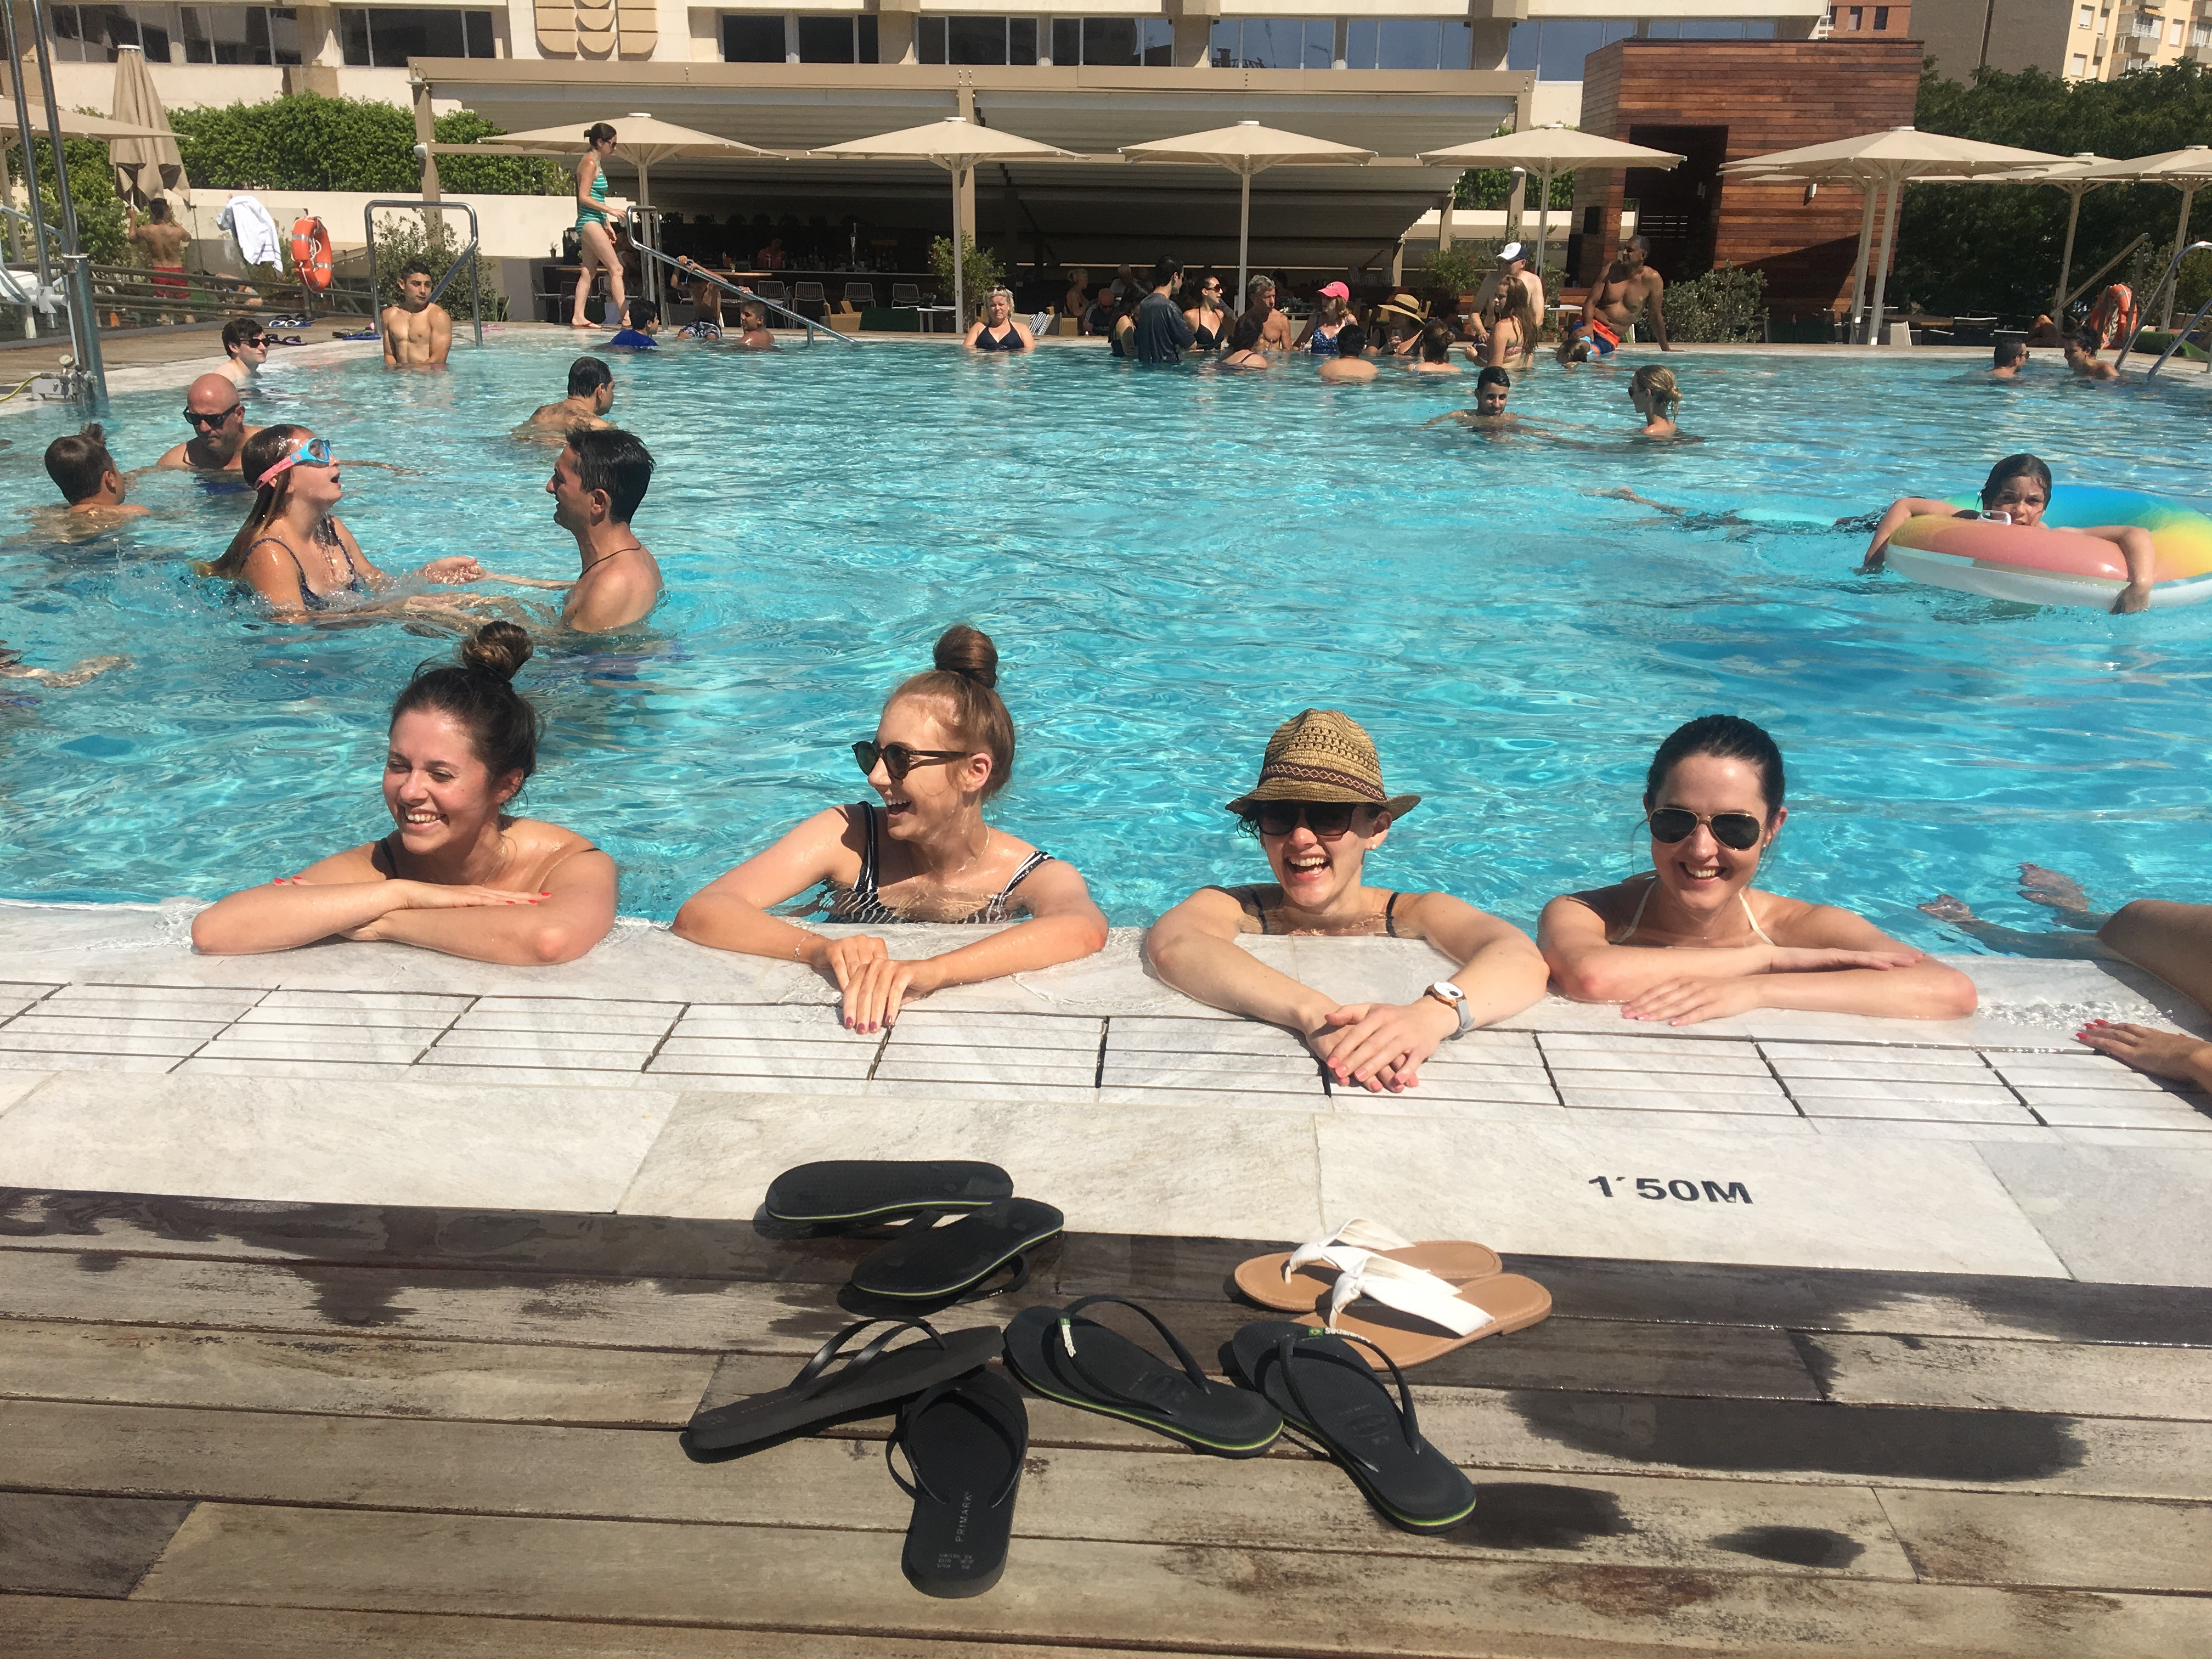 Hotel Melia Sevilla Swimming Pool